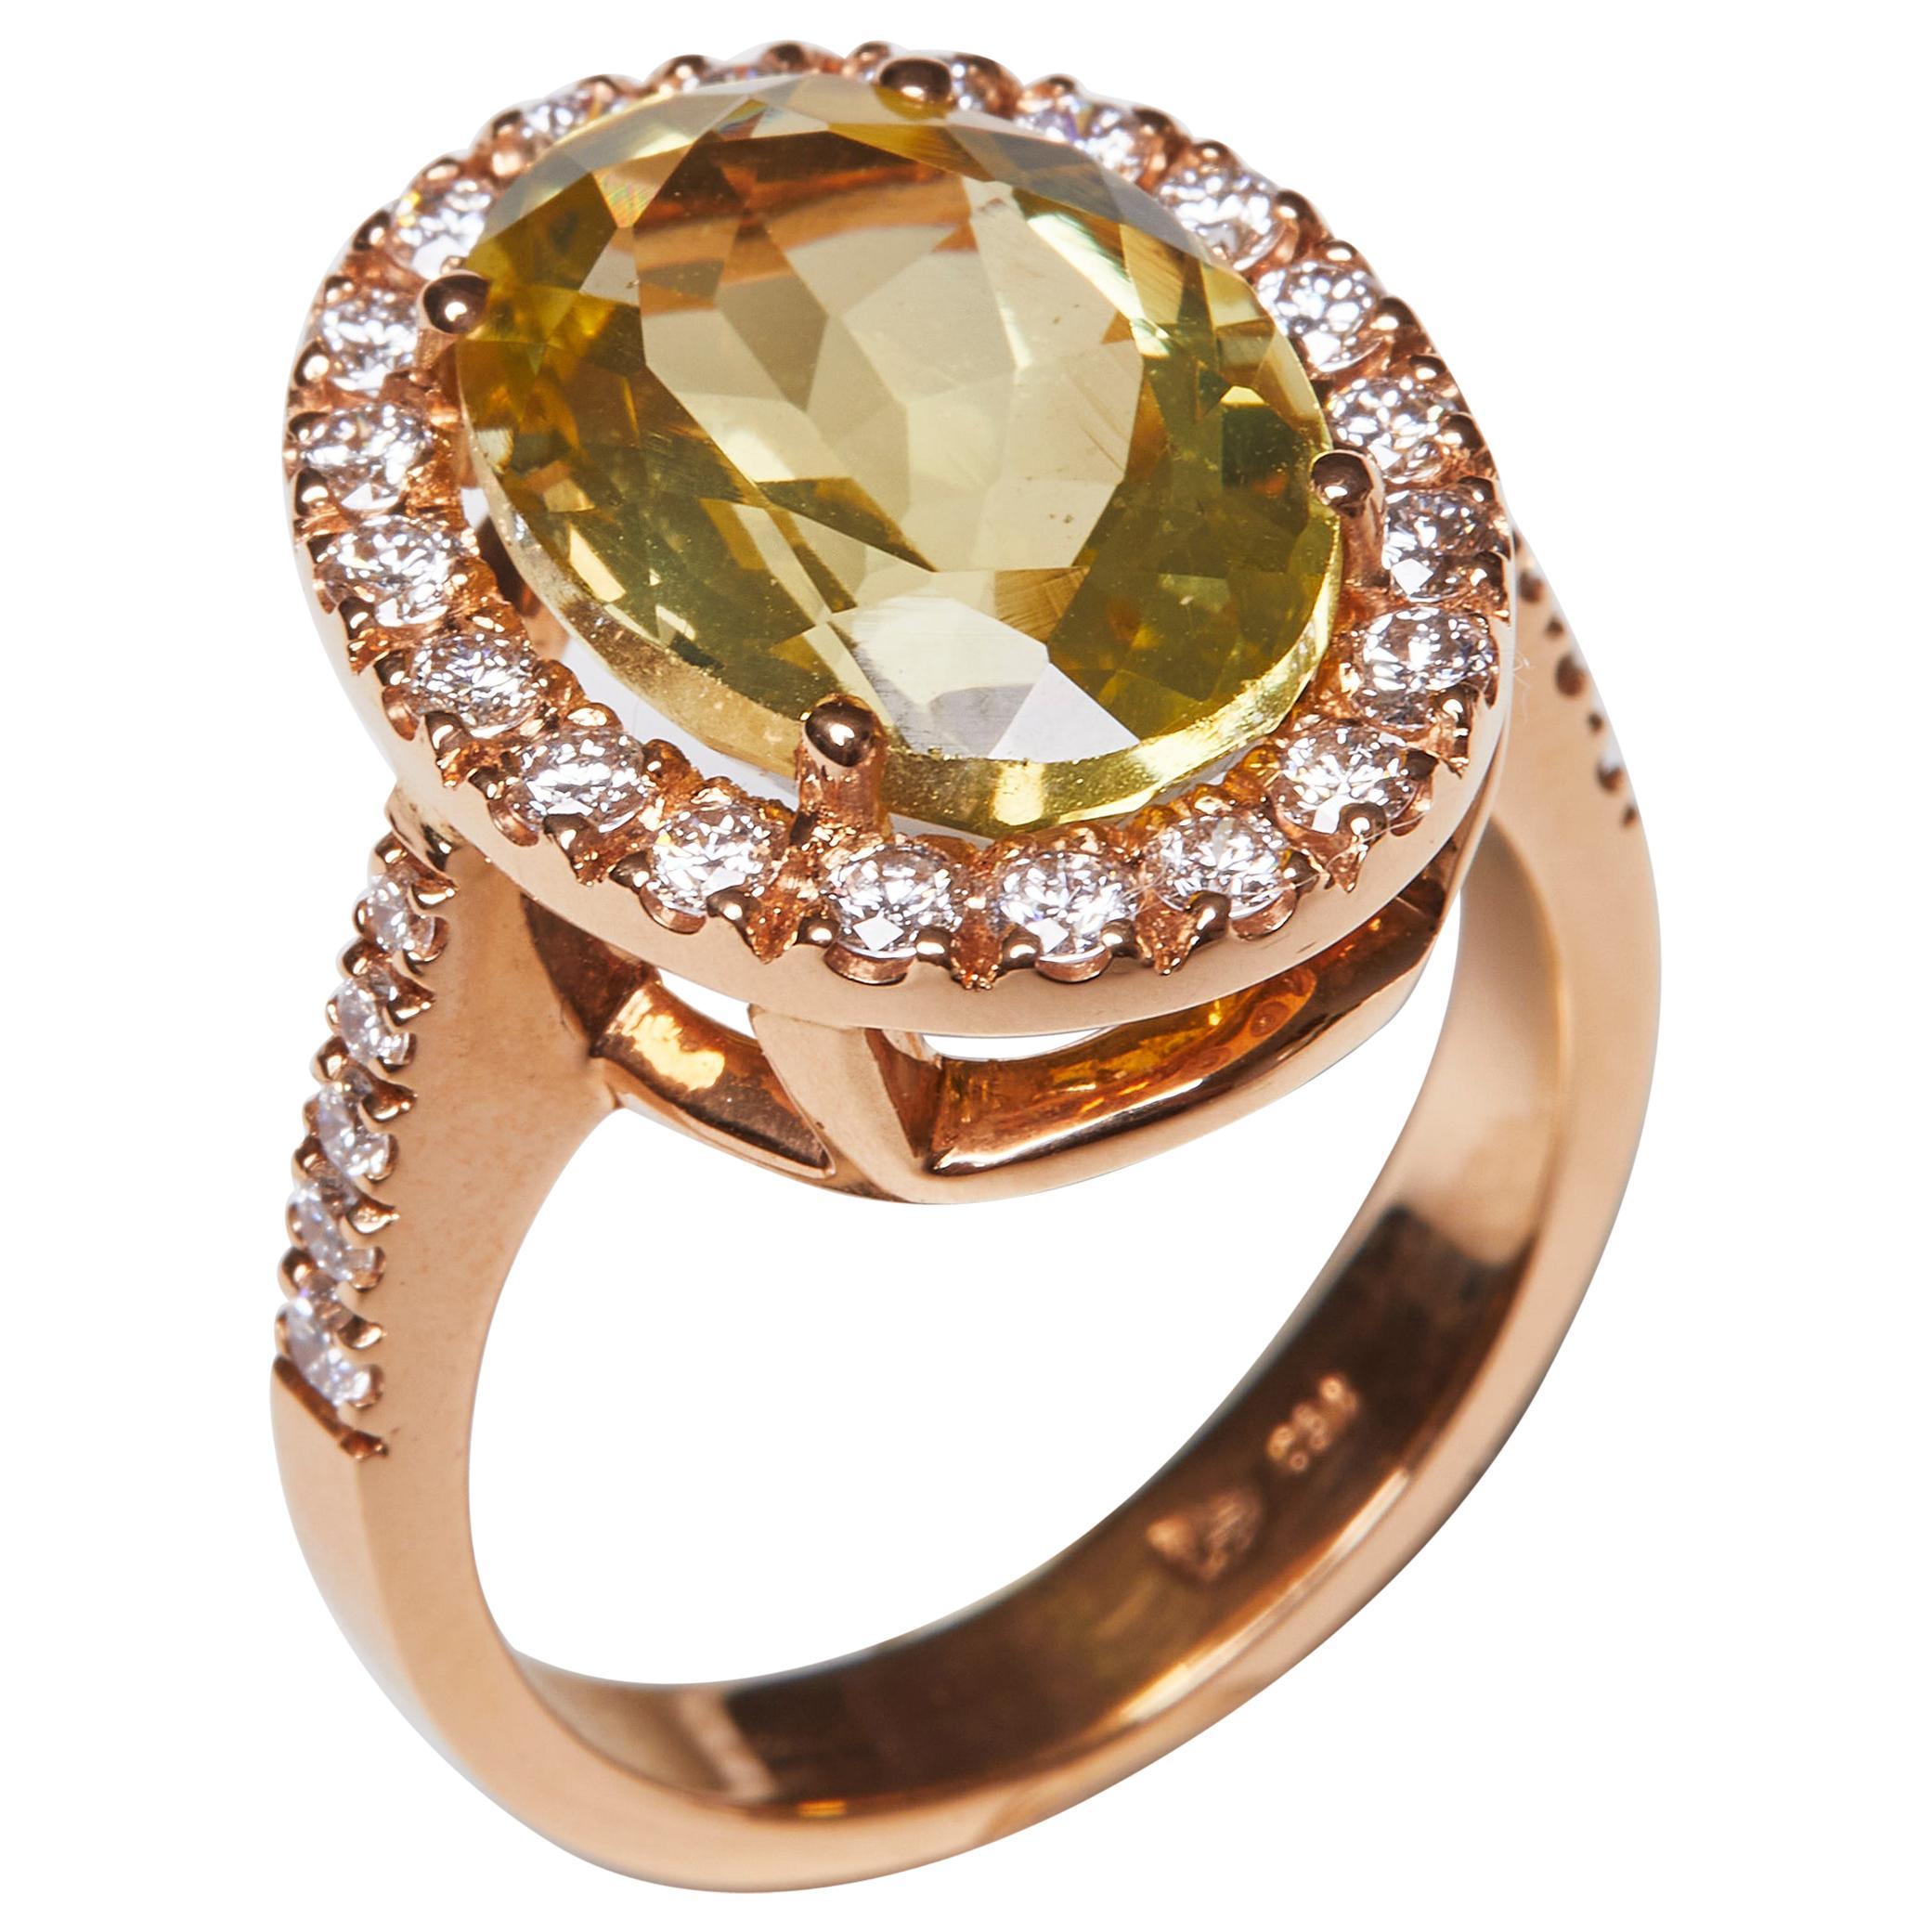 18 Karat Rose Gold Diamond and Citrine Cocktail Ring